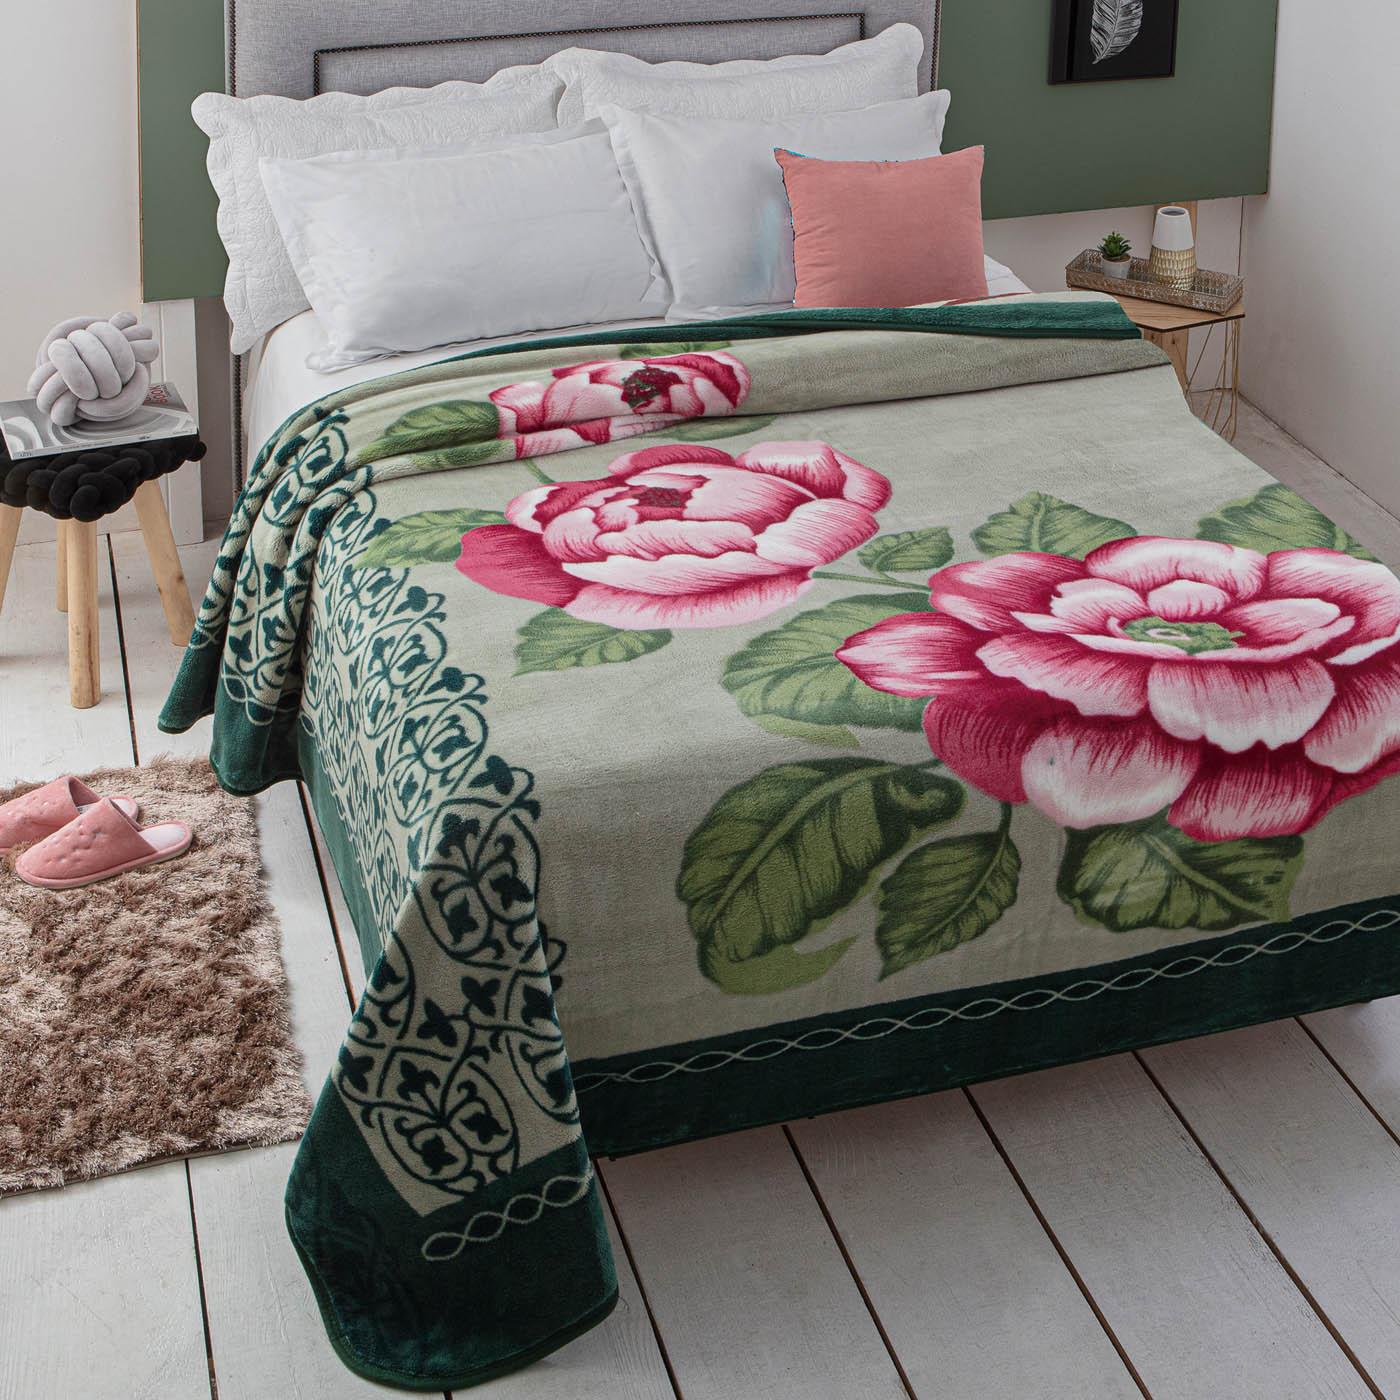 Cobertor Jolitex Casal Kyor Plus 1,80x2,20m Carini Verde